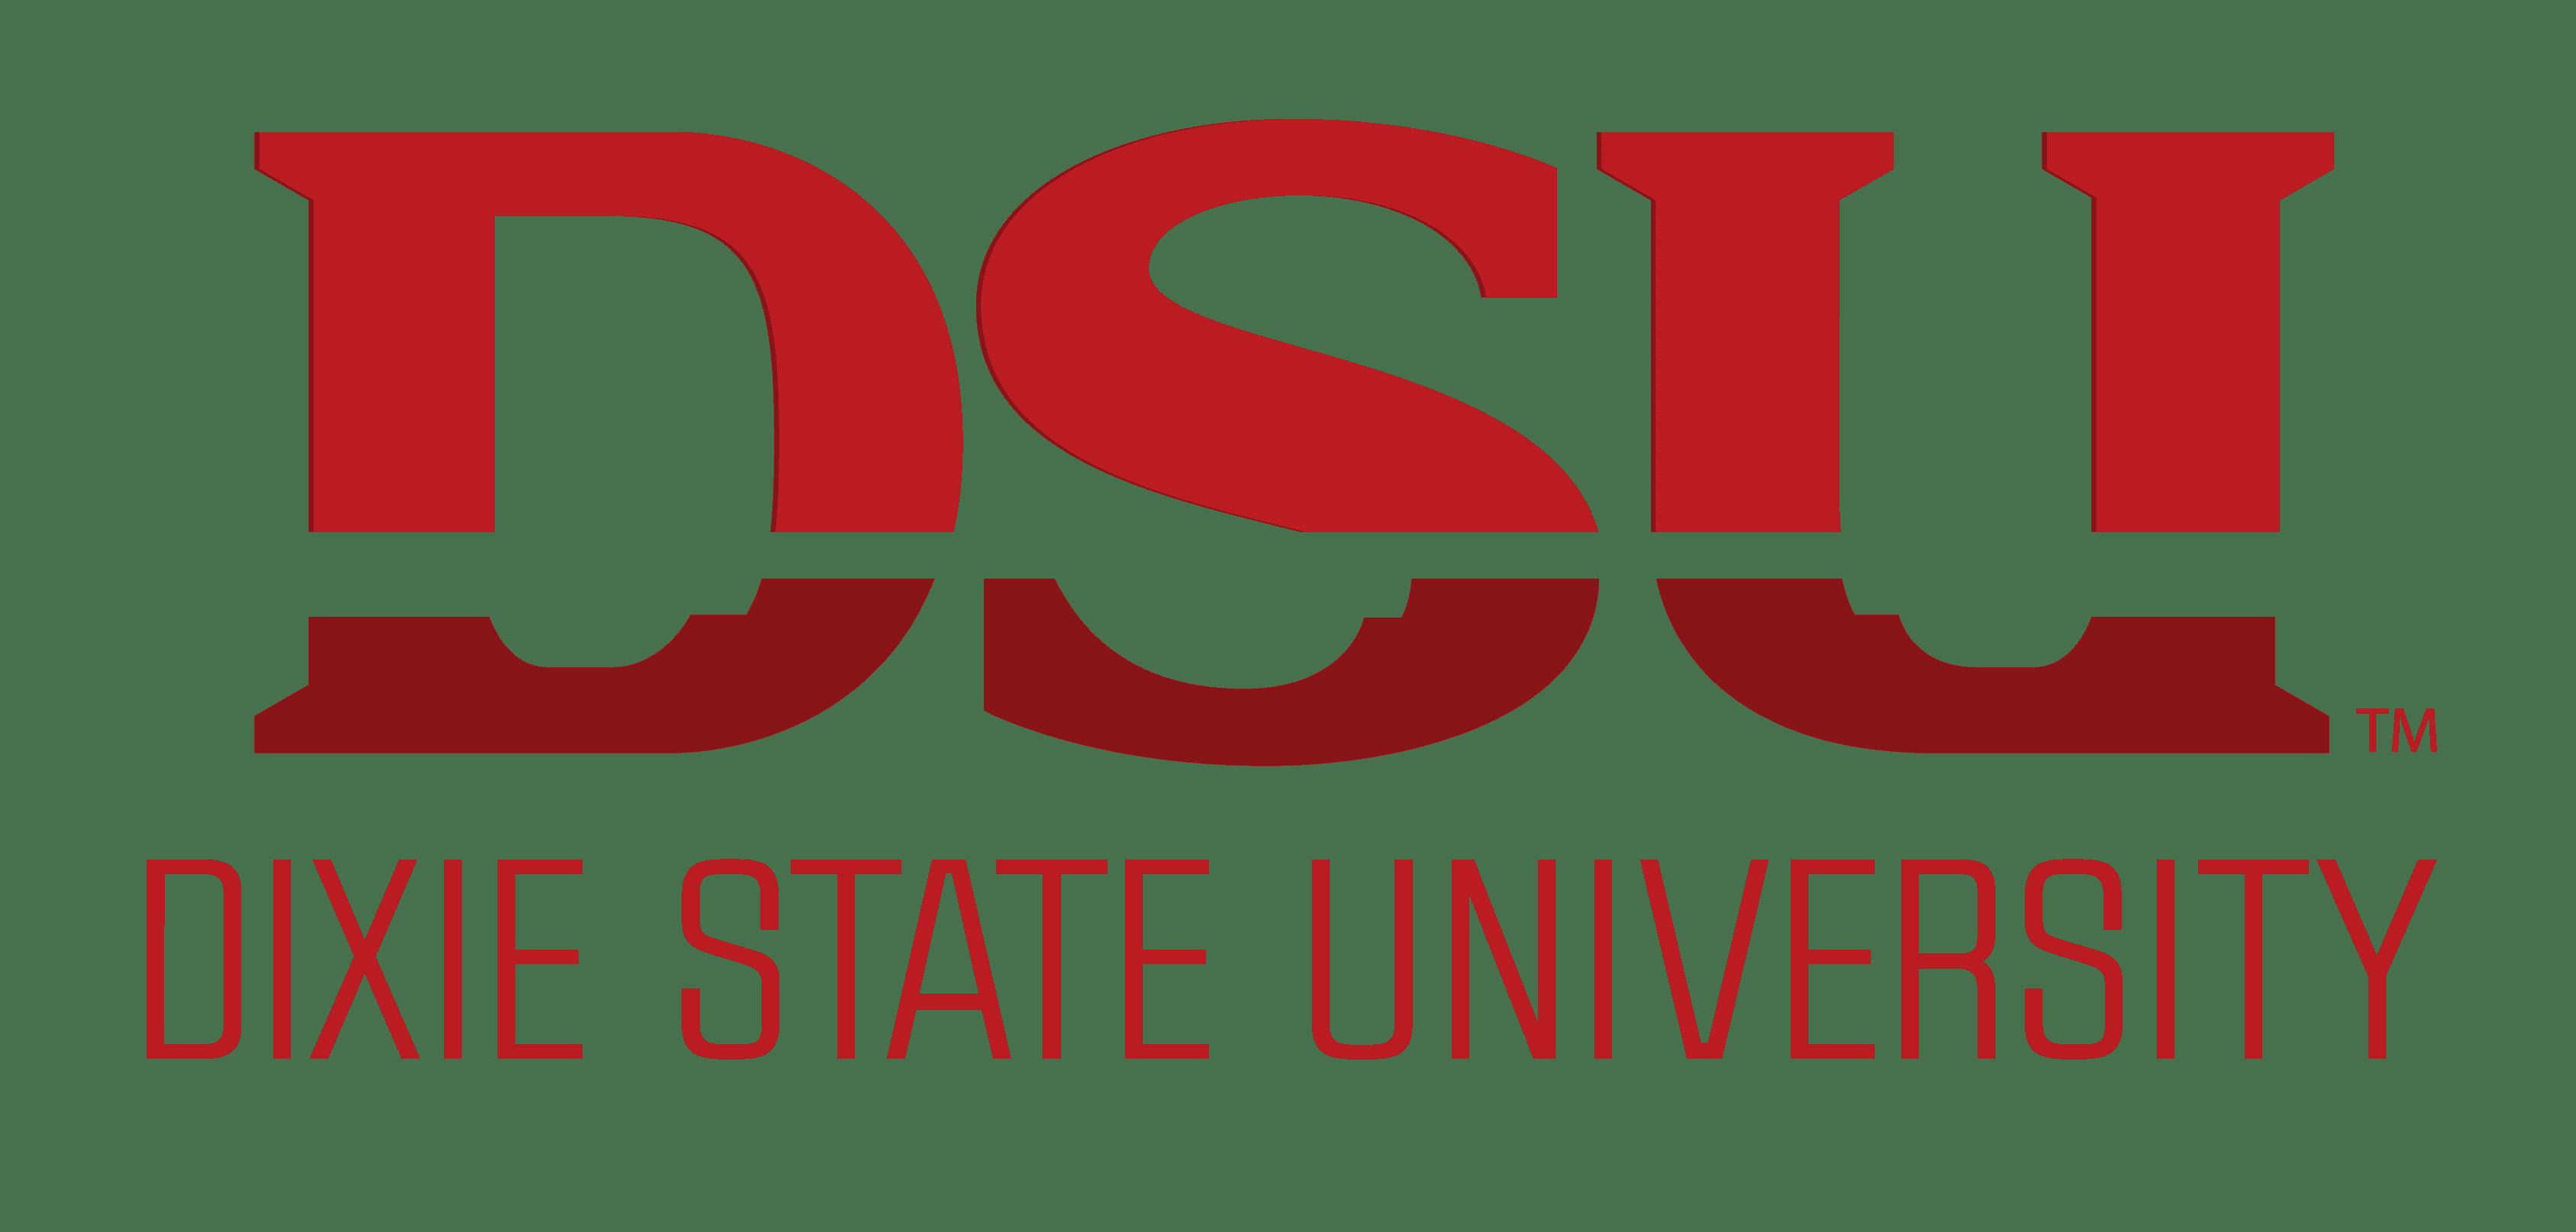 Dixie State University